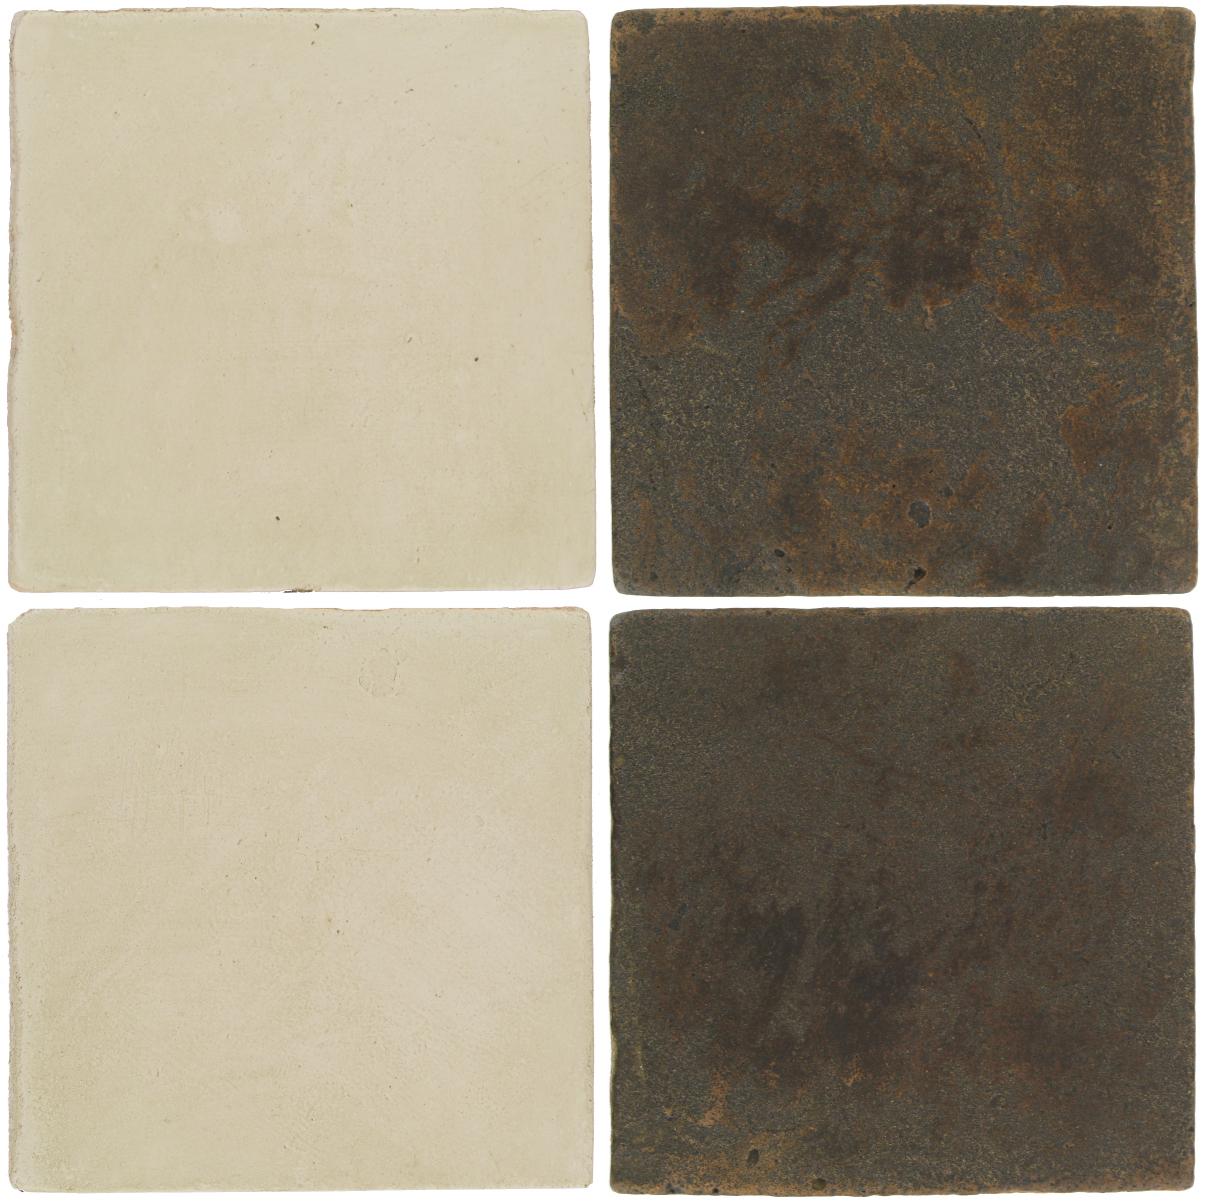 Pedralbes Antique Terracotta  2 Color Combinations  OHS-PGLW Glacier White + VTG-PSCO Cologne Brown